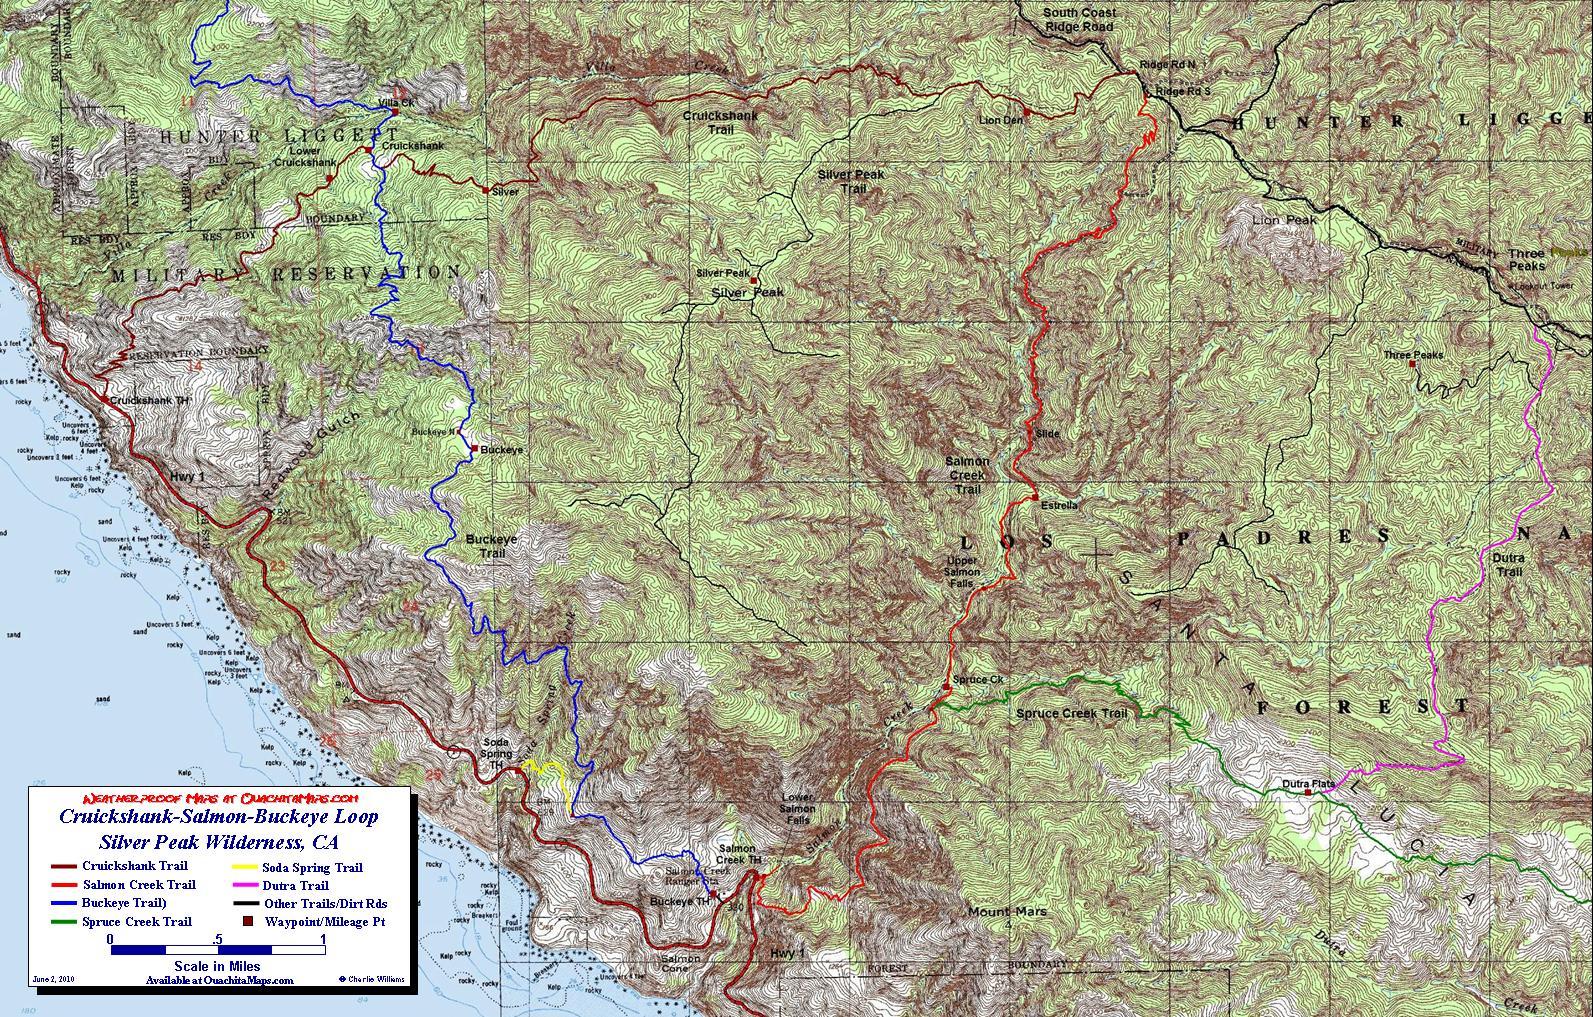 Cruickshank-Salmon-Buckeye Loop Trail, Silver Peak Wilderness - California Wilderness Map